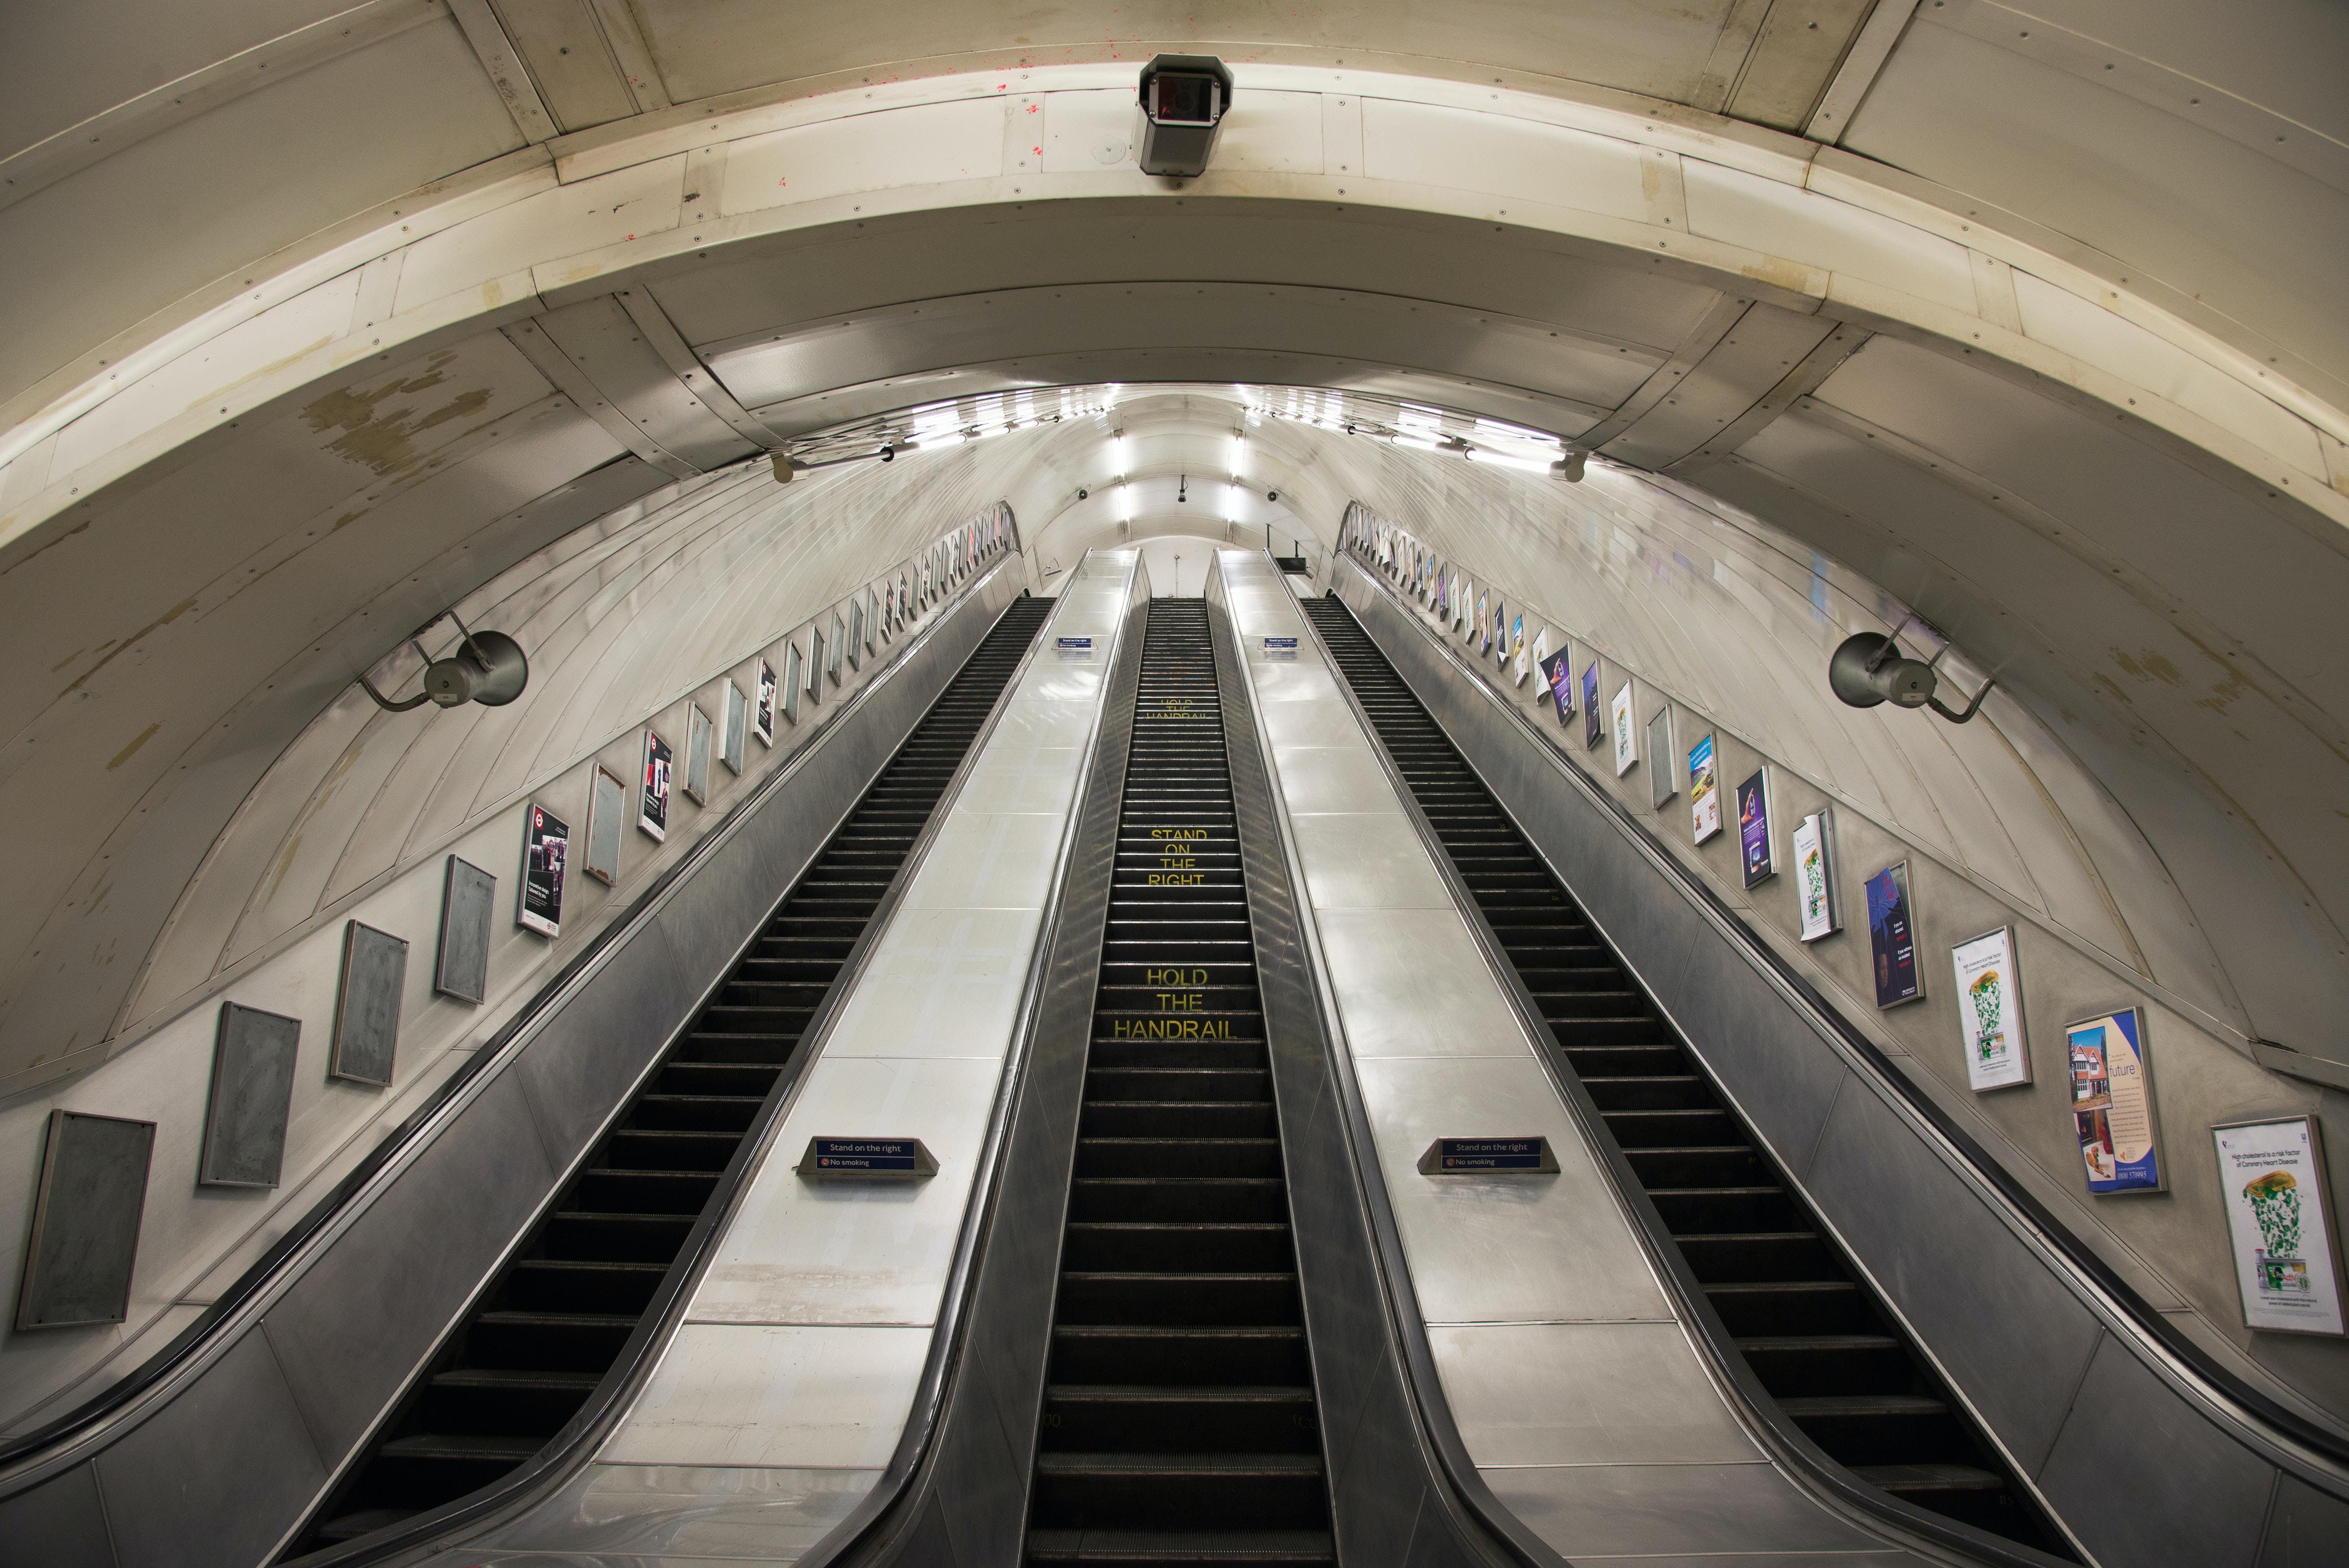 worm's eye view of escalator